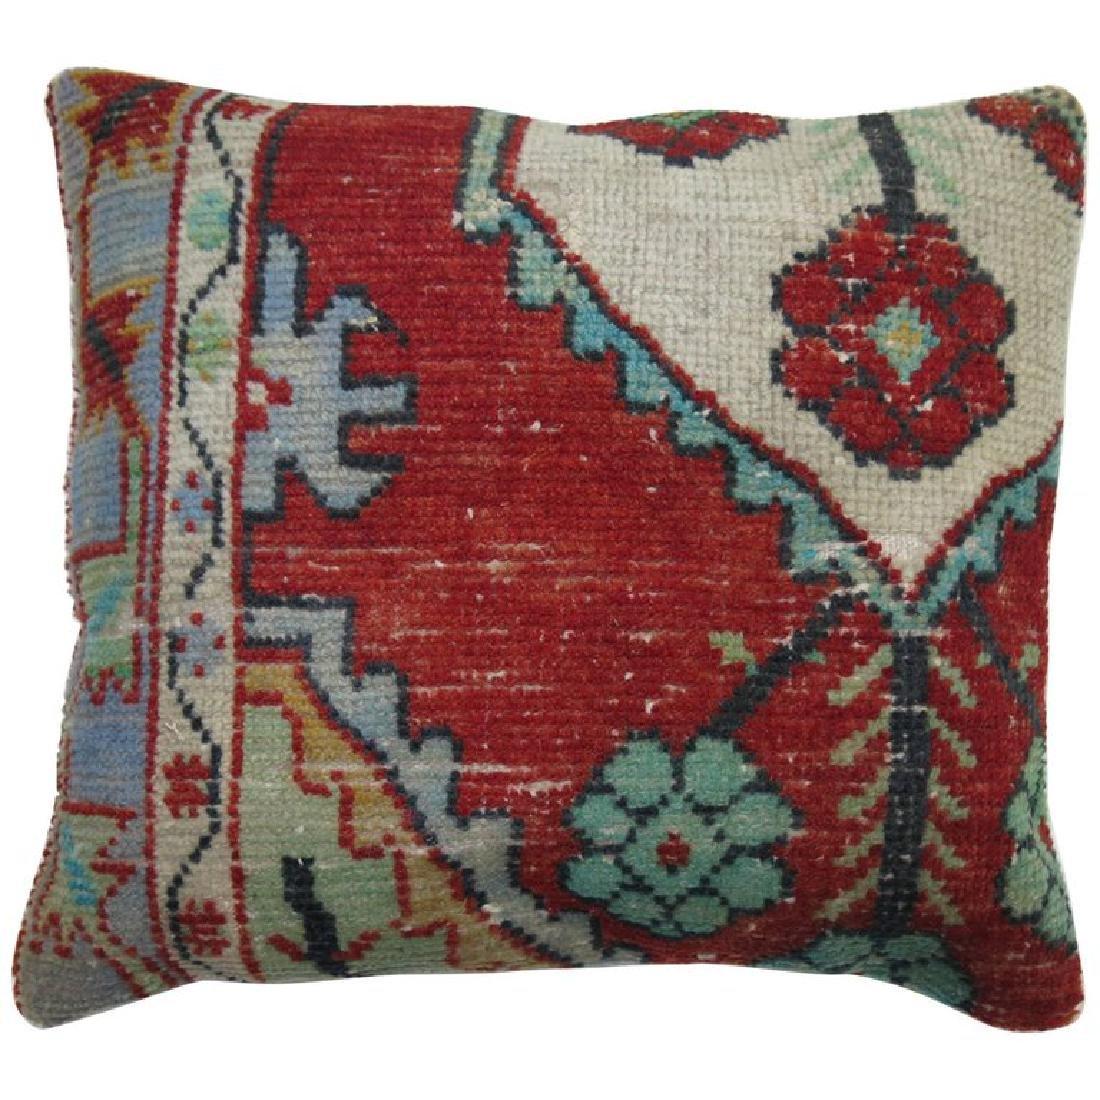 Turkish Anatolian Rug Pillow 1.4x1.6x1.6